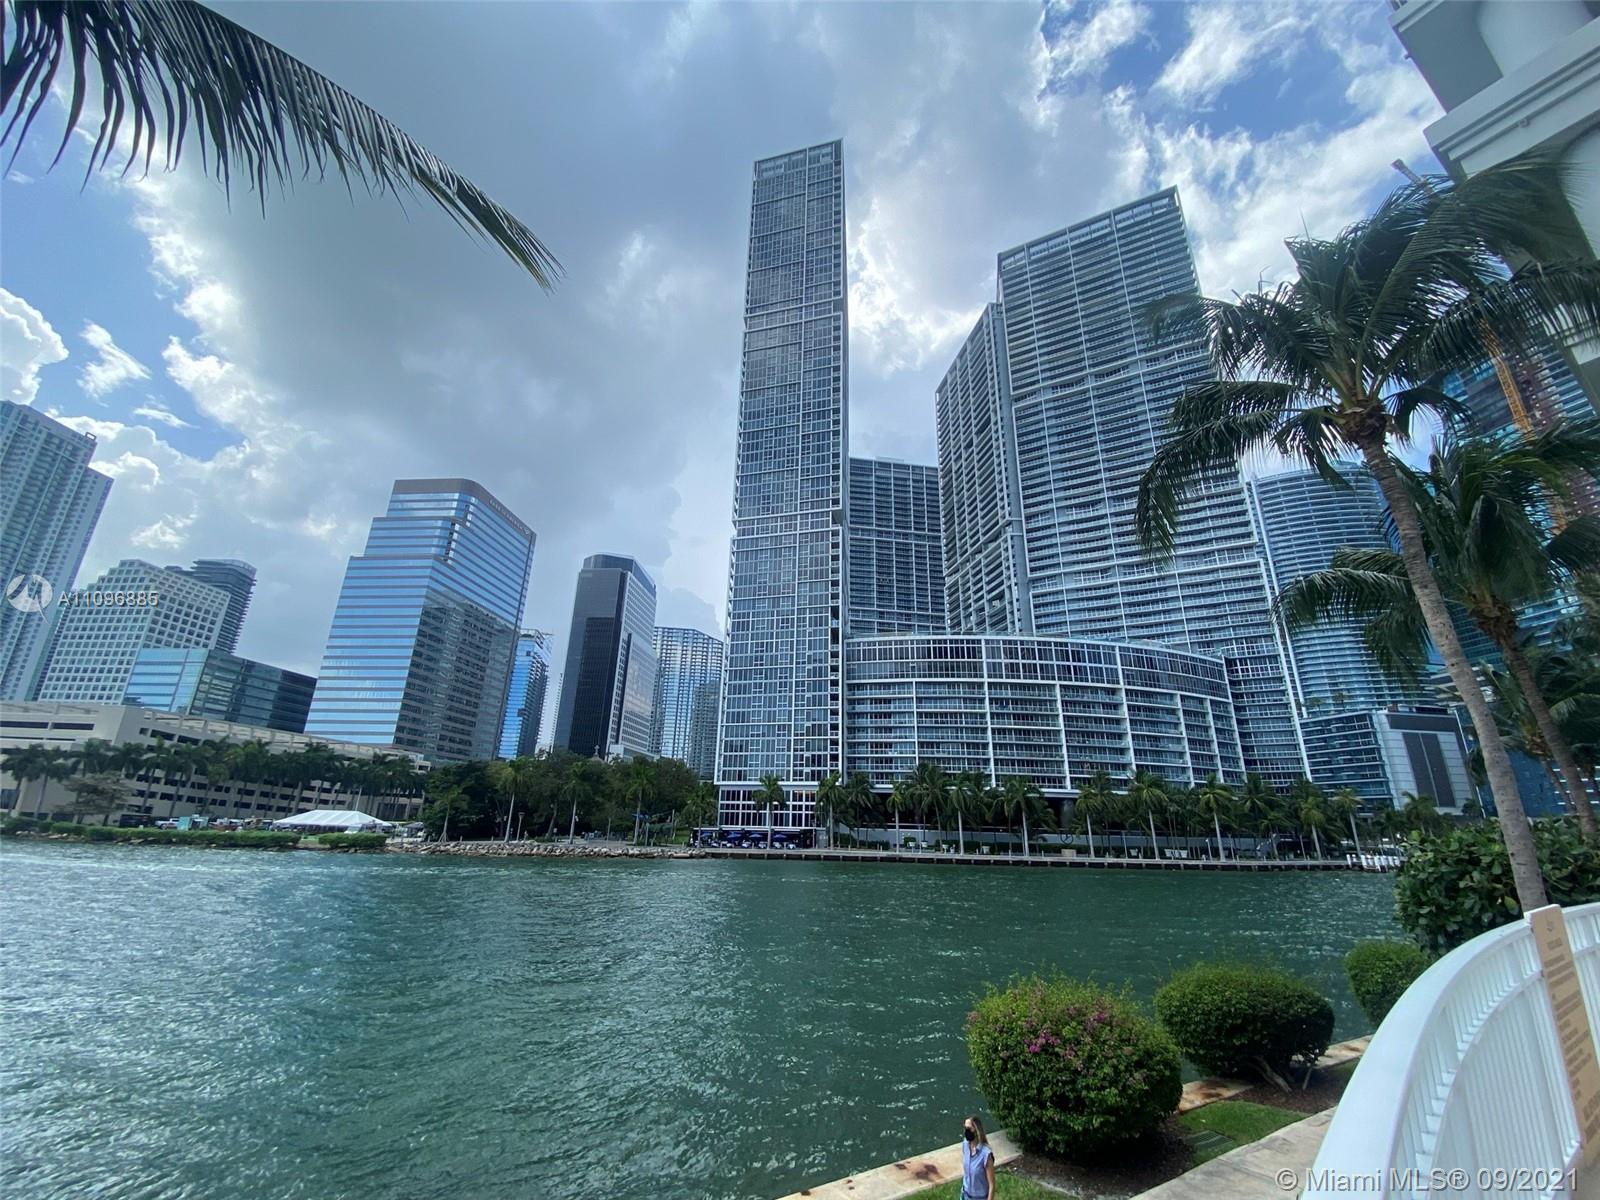 Courts Brickell Key #1009 - 801 Brickell Key Blvd #1009, Miami, FL 33131